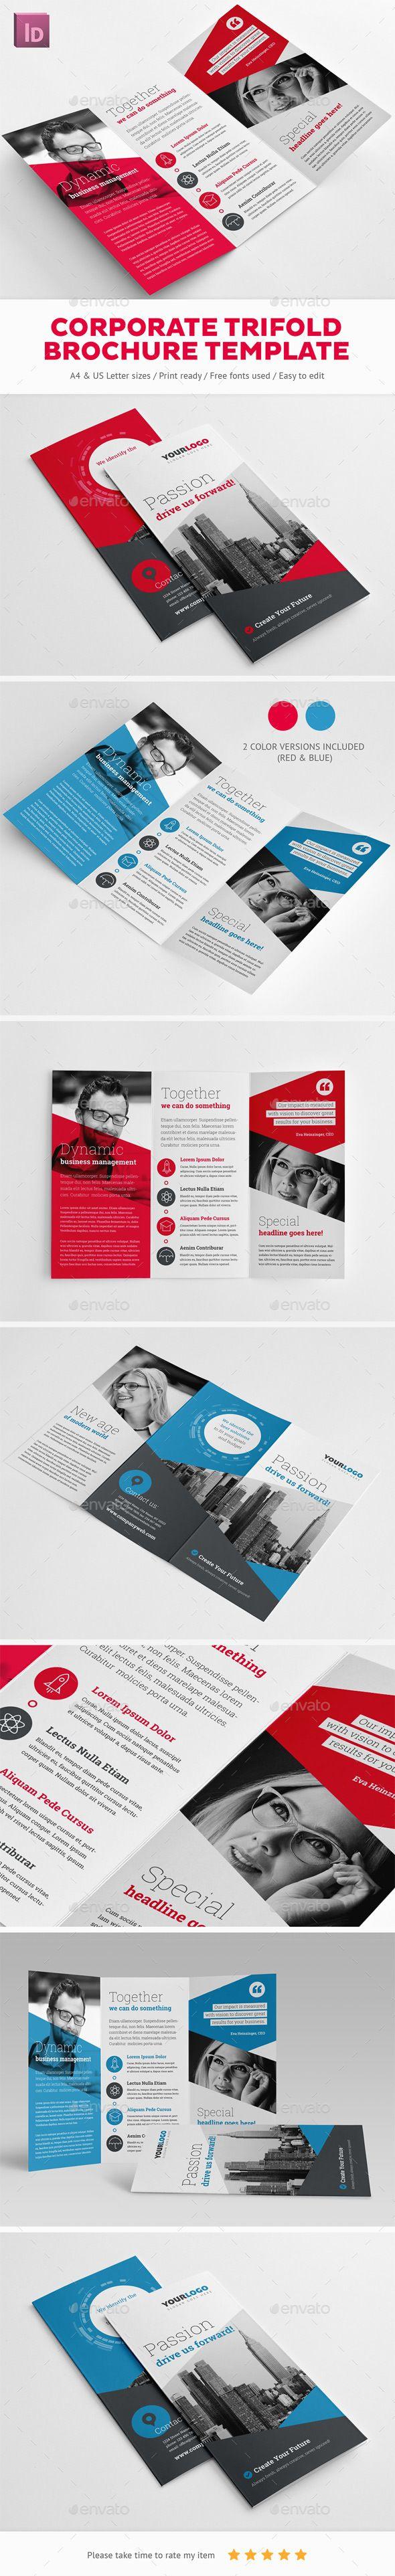 Corporate Trifold Brochure Template   Pinterest   Tríptico, Folletos ...